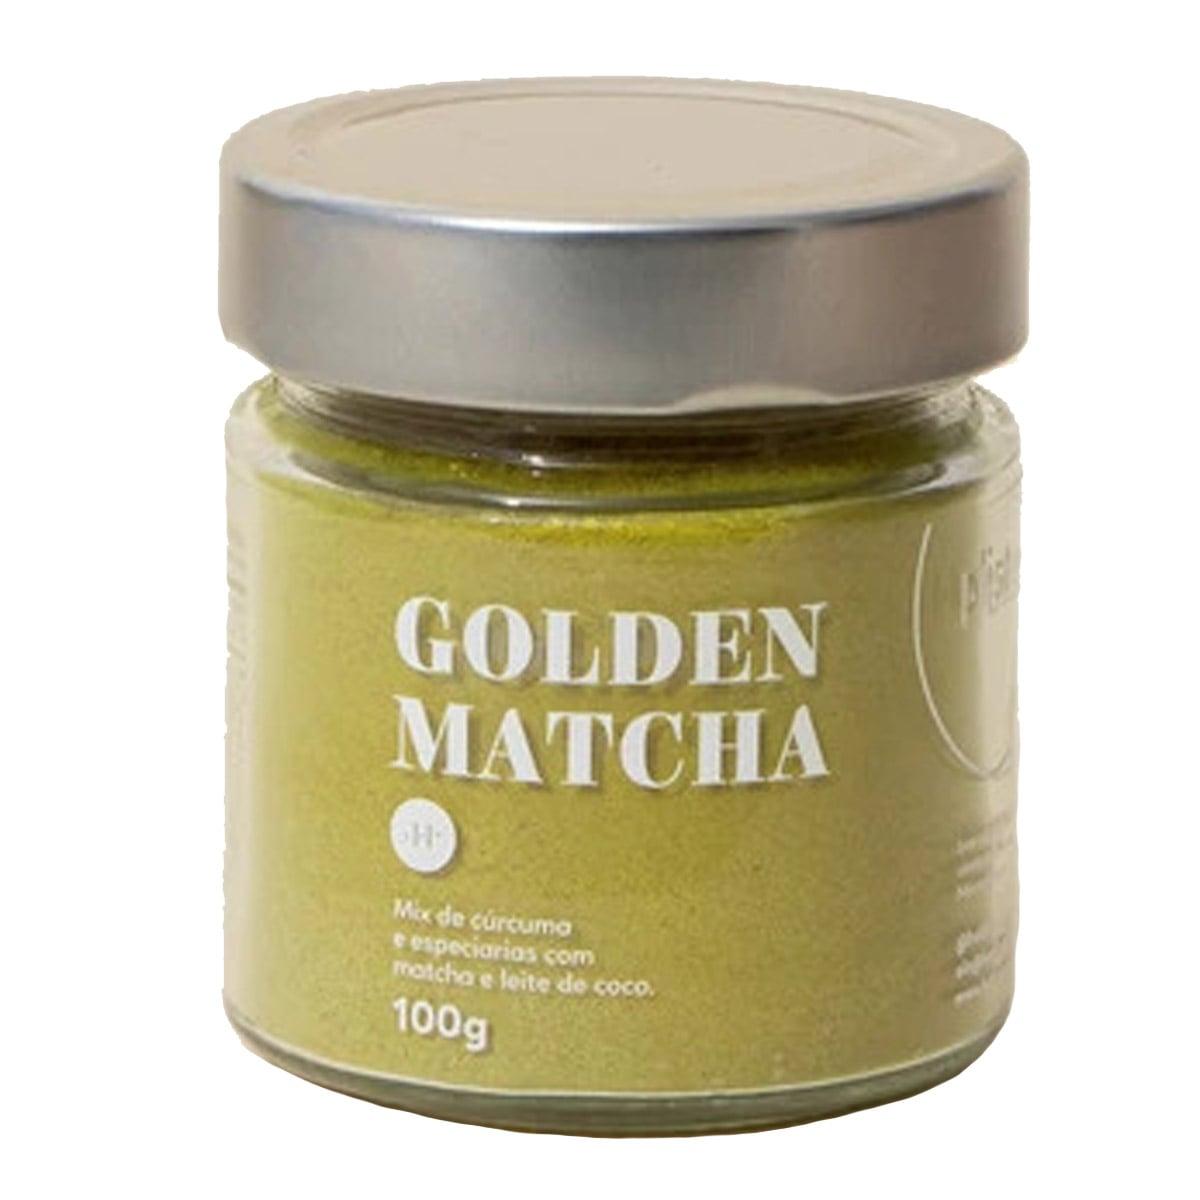 Golden matcha 100g - Holistix